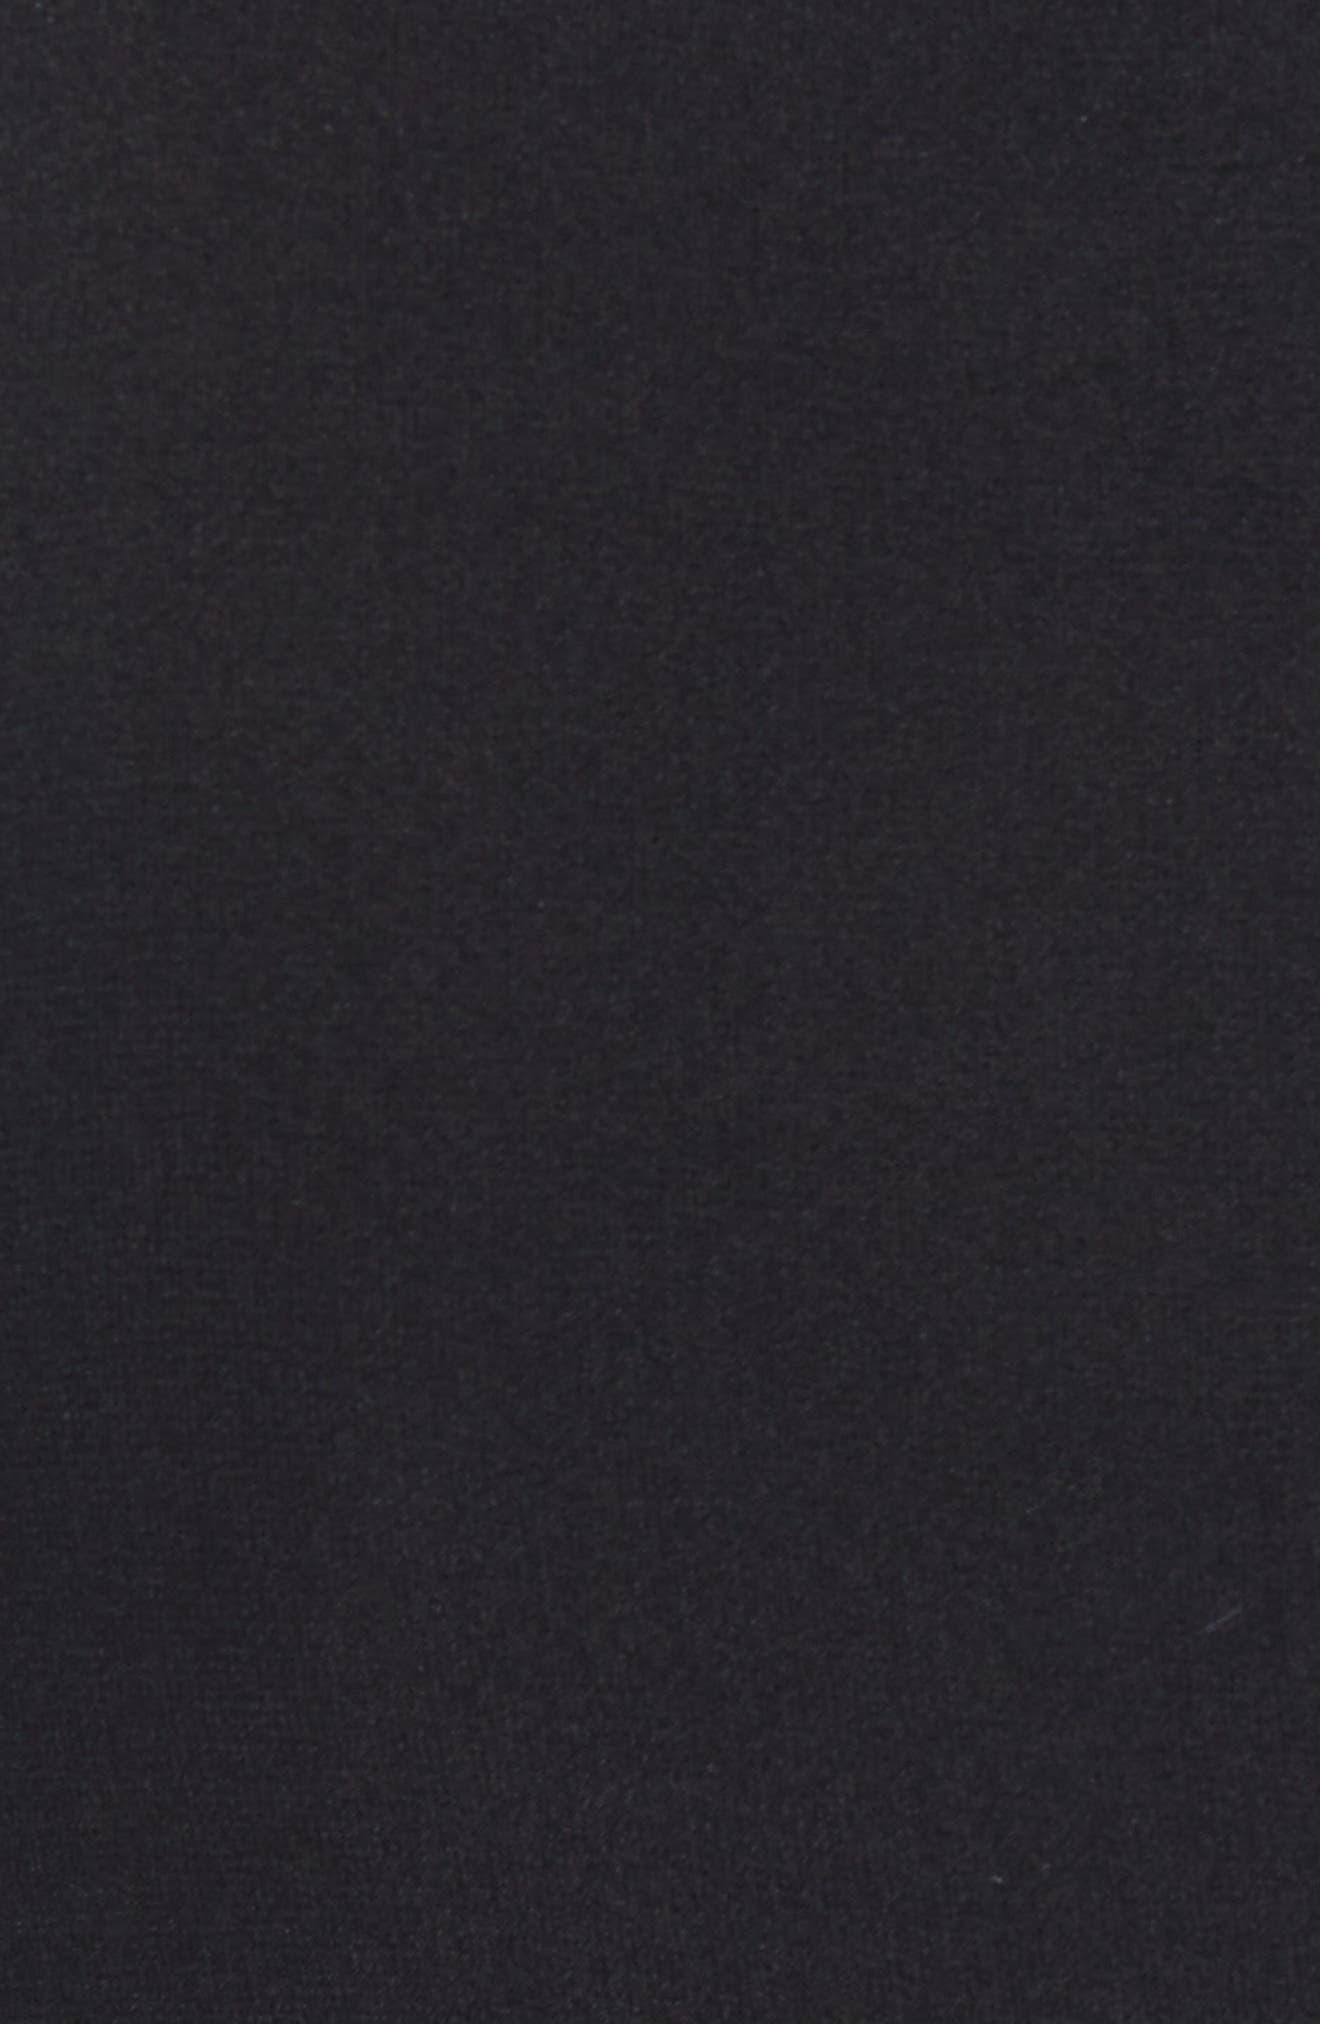 Ruffle Front Corded Lace Hem Dress,                             Alternate thumbnail 5, color,                             Black